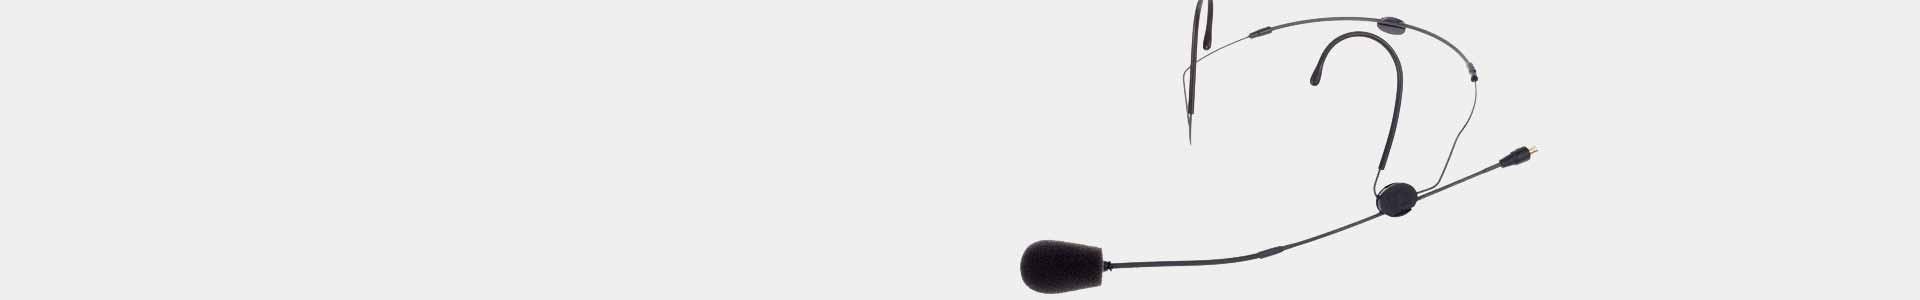 Sennheiser Headband Microphones in Avacab Audiovisuales